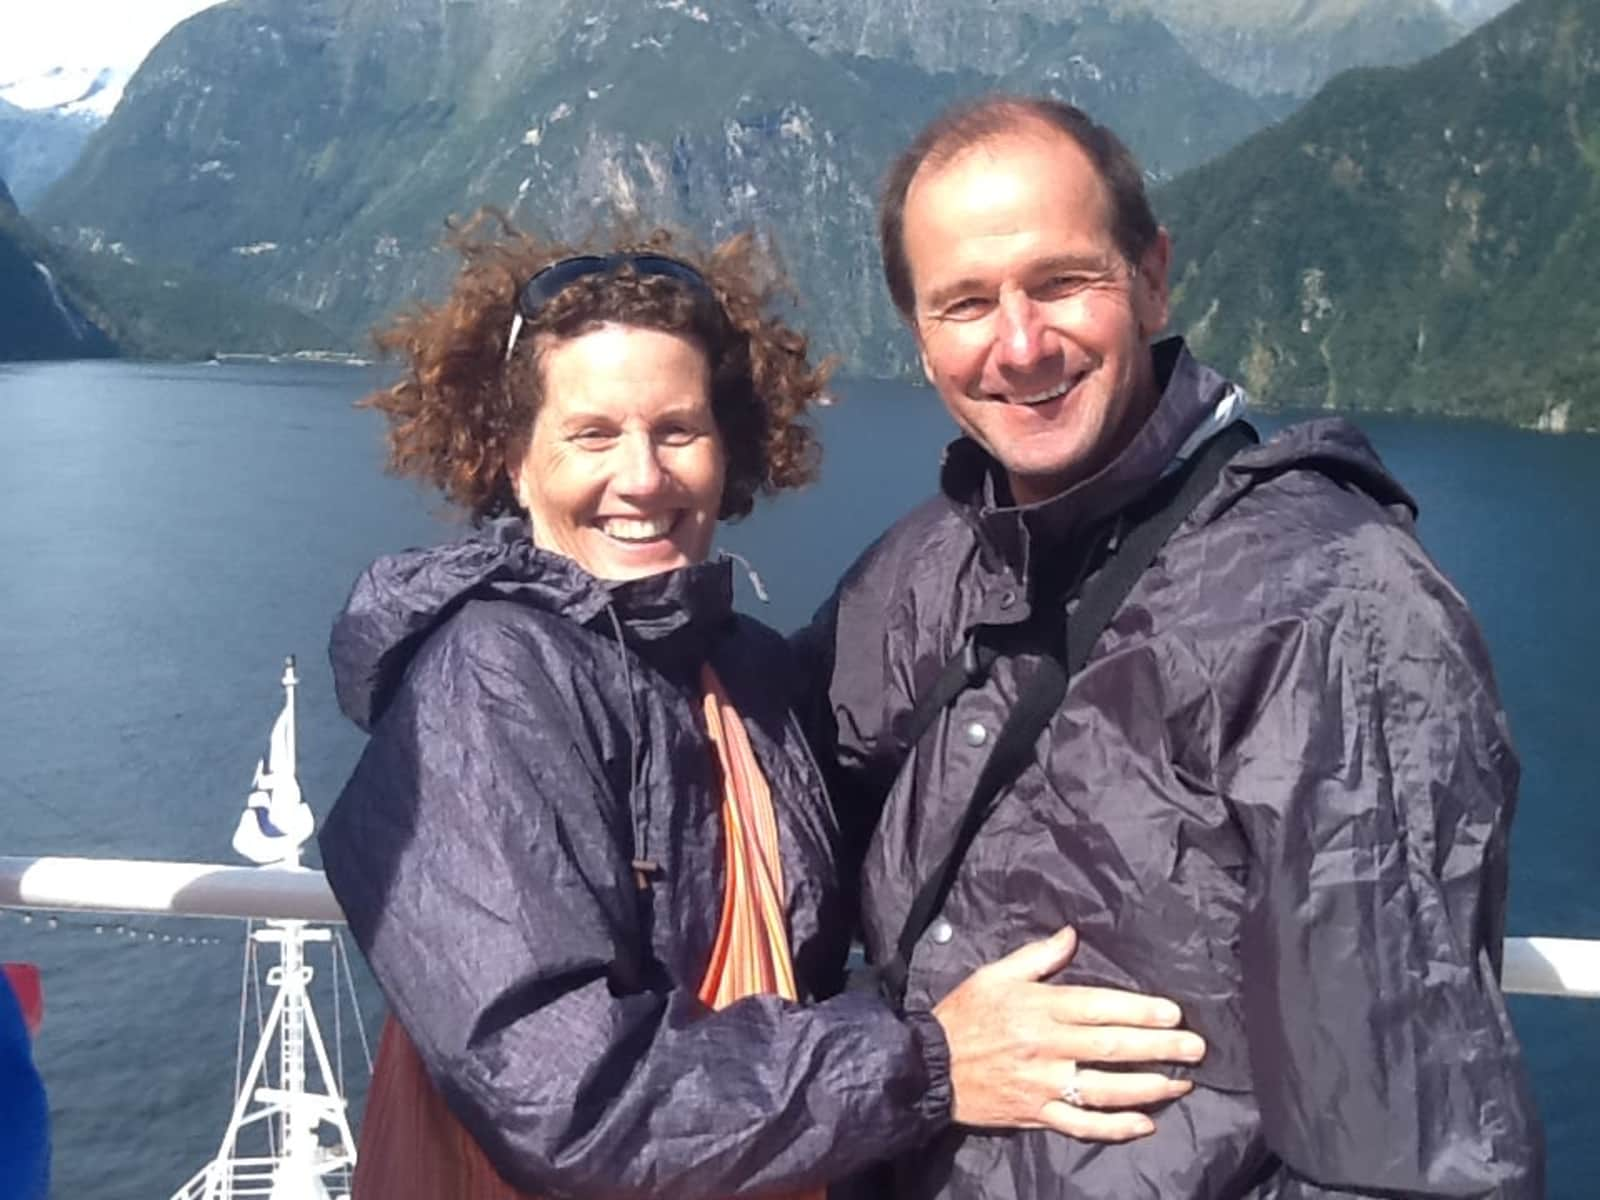 Wendy & John from Melbourne, Victoria, Australia